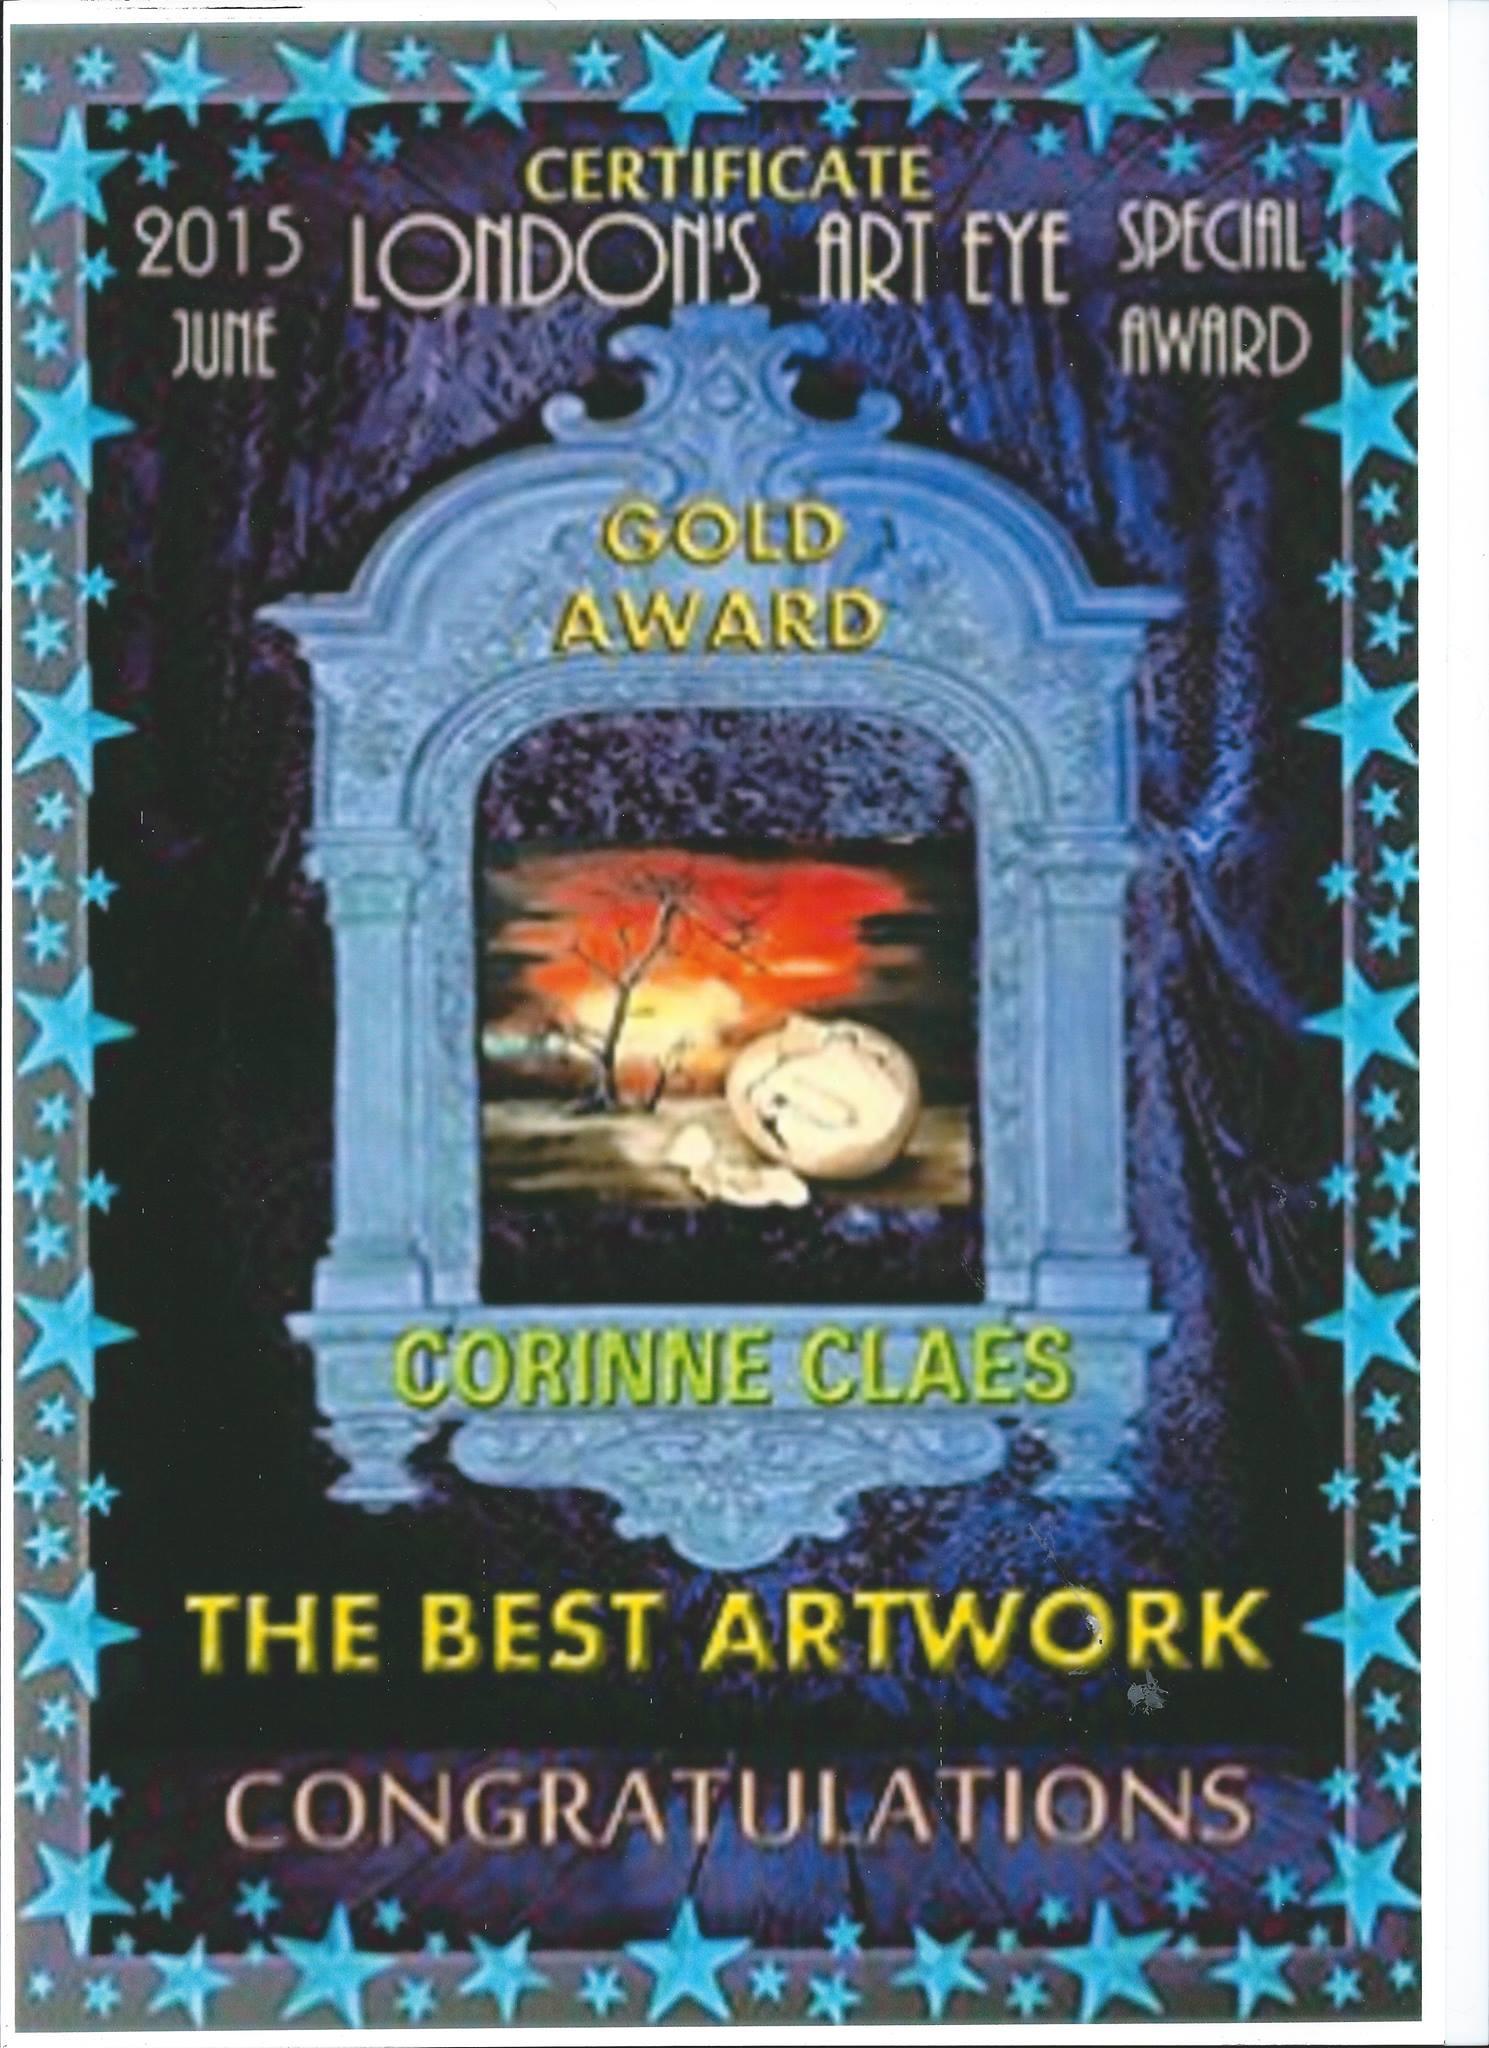 Best Artwork Certificate